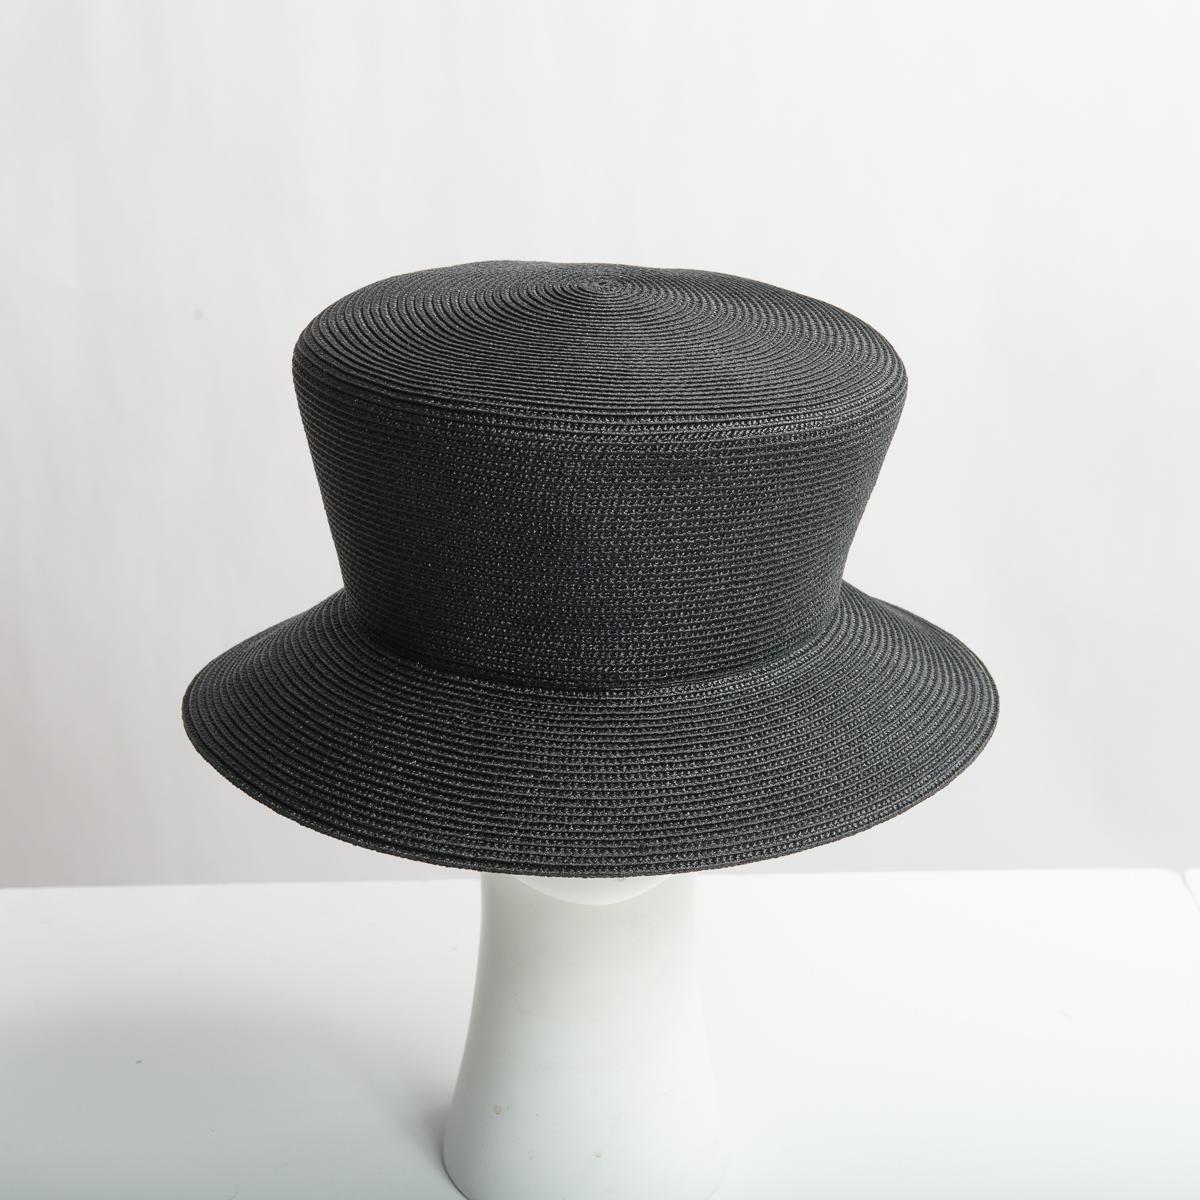 26a63111303415 Black Dull Polypropylene Straw Medium Brim Plain Hats-Y6030_88-05- Sun  Yorkos | Zoria